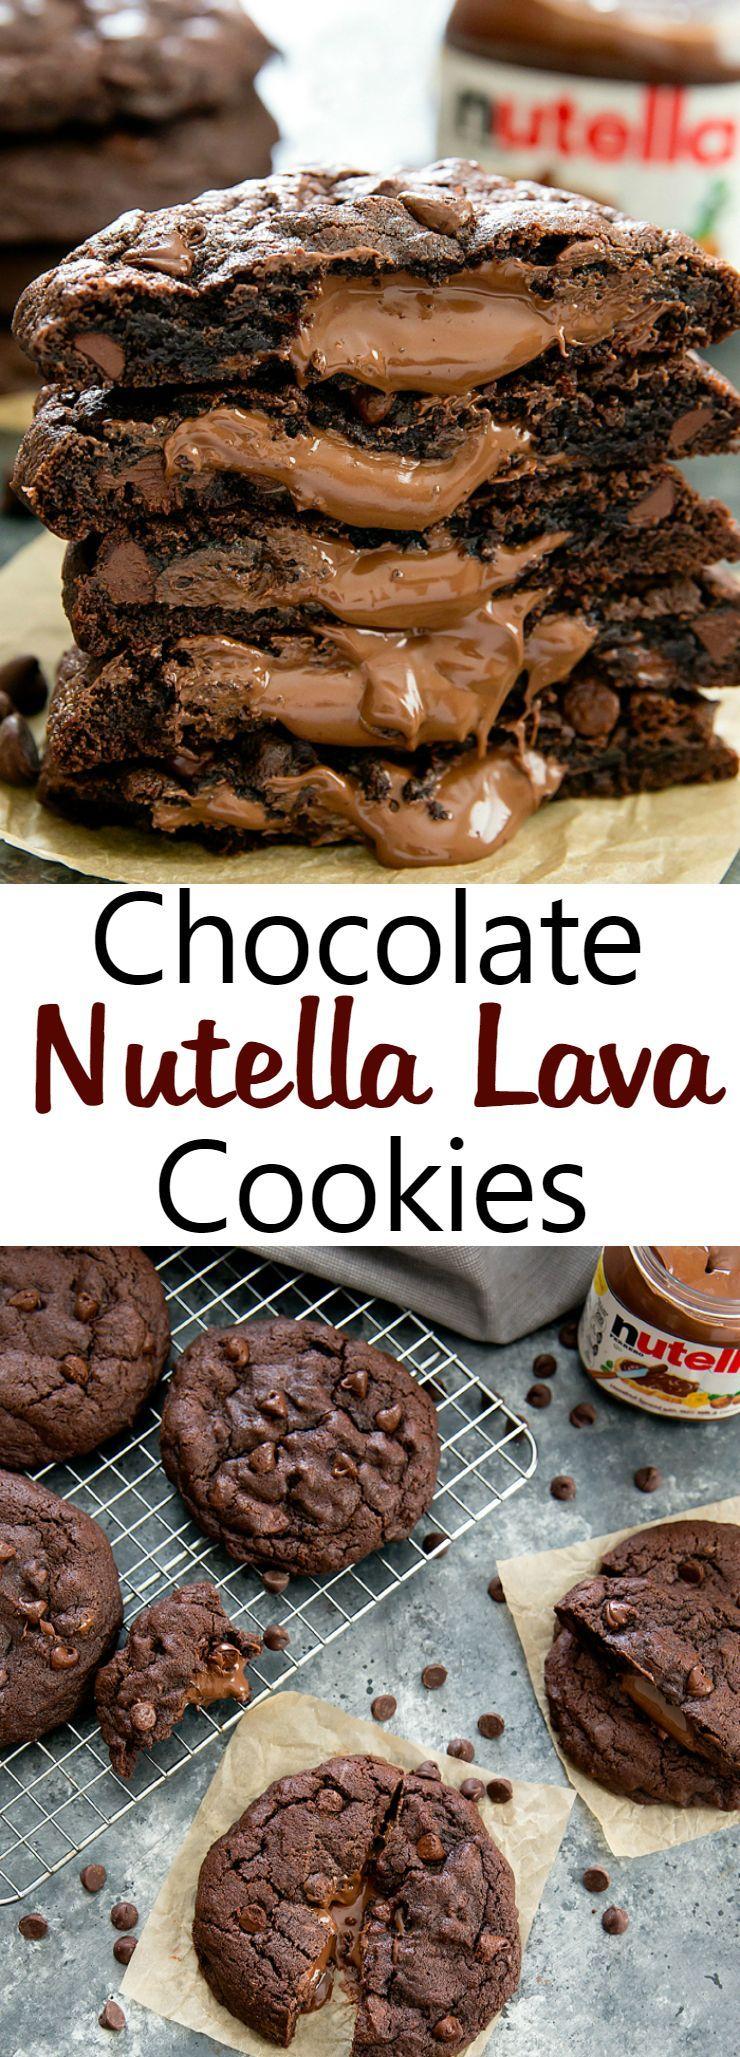 Photo of Chocolate Nutella Lava Cookies